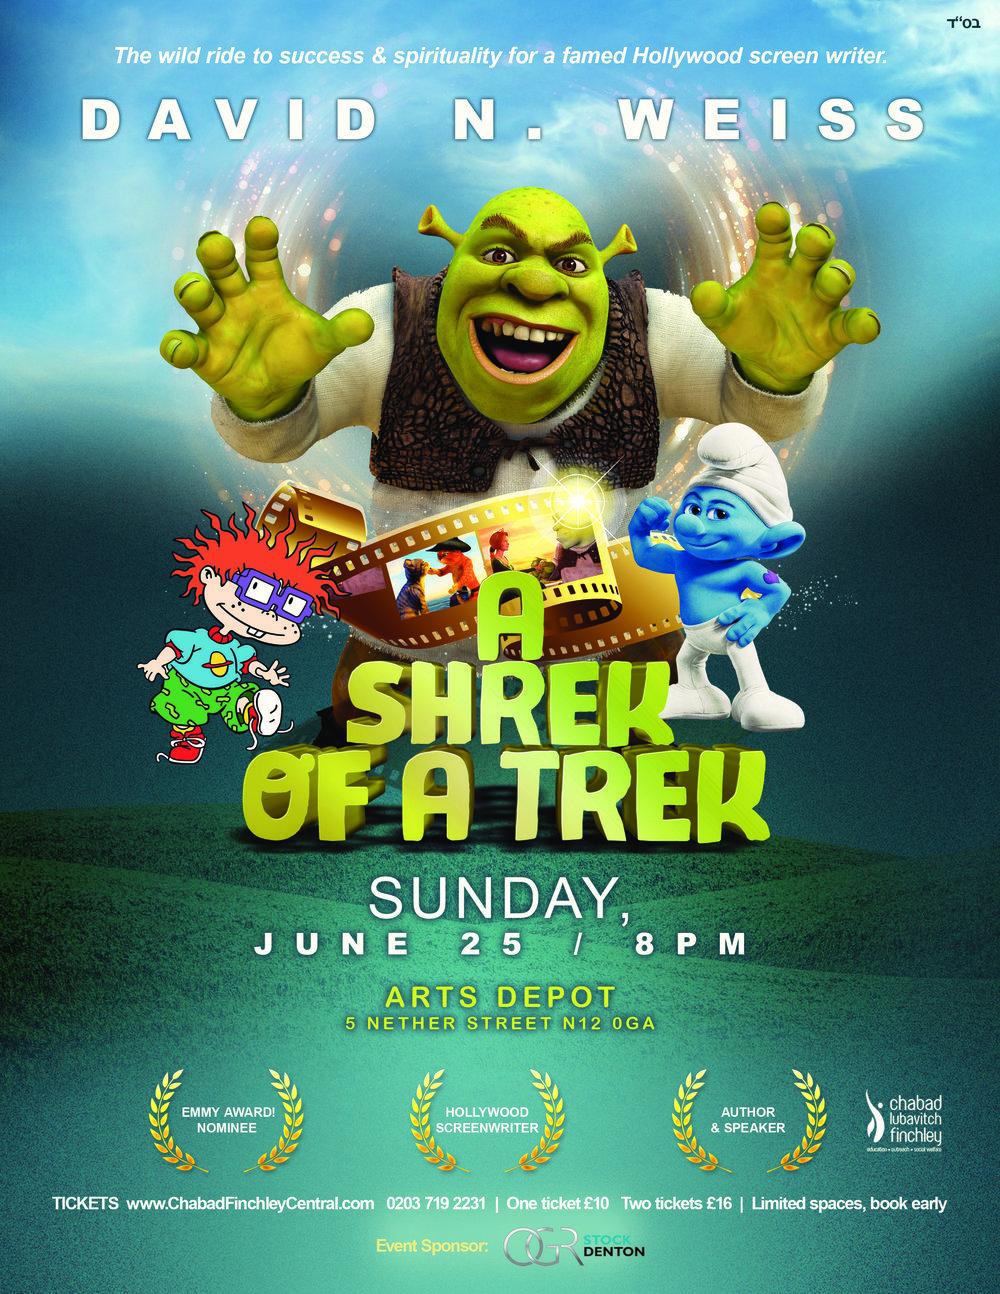 Shrek_8_5x11 (2)-page-0.jpg